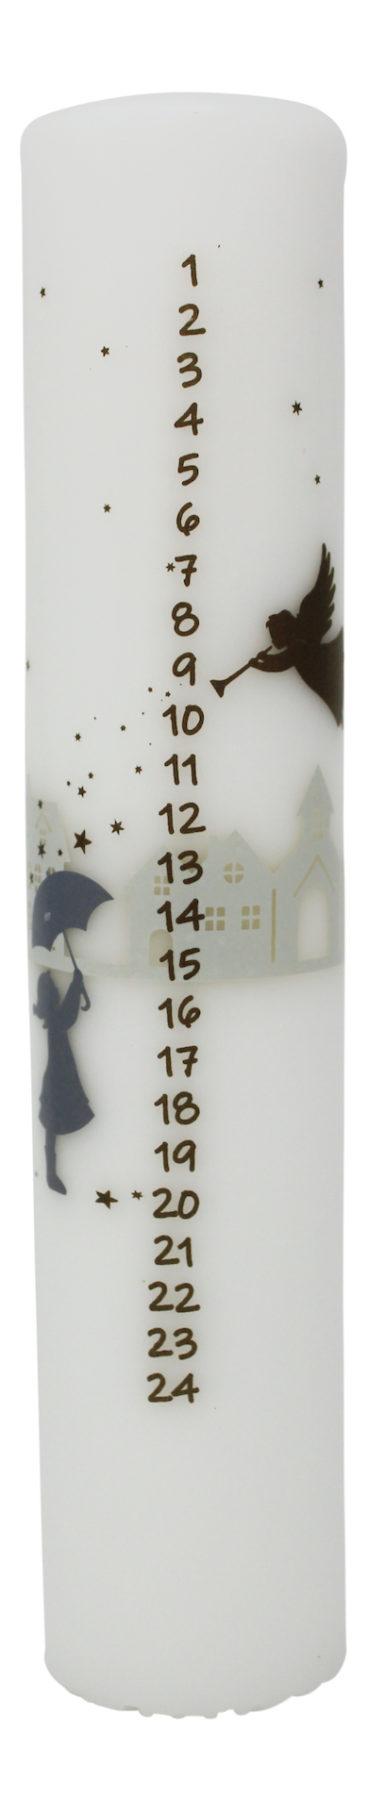 smukt-kalenderlys